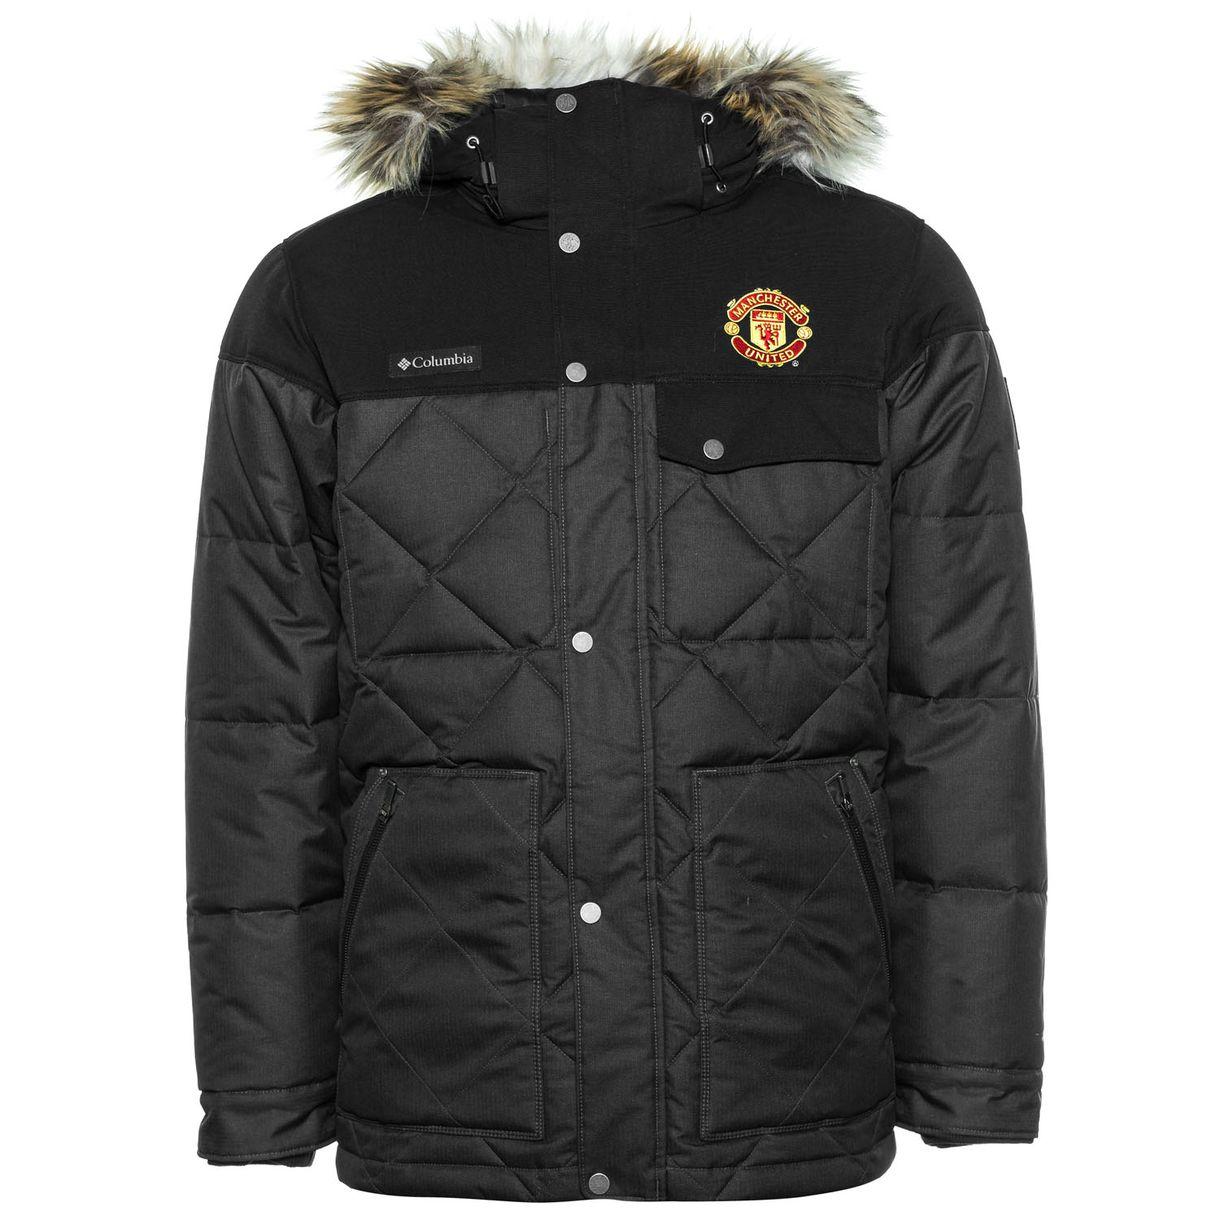 Manchester United x Columbia Jacket Barlow Pass 550 ...